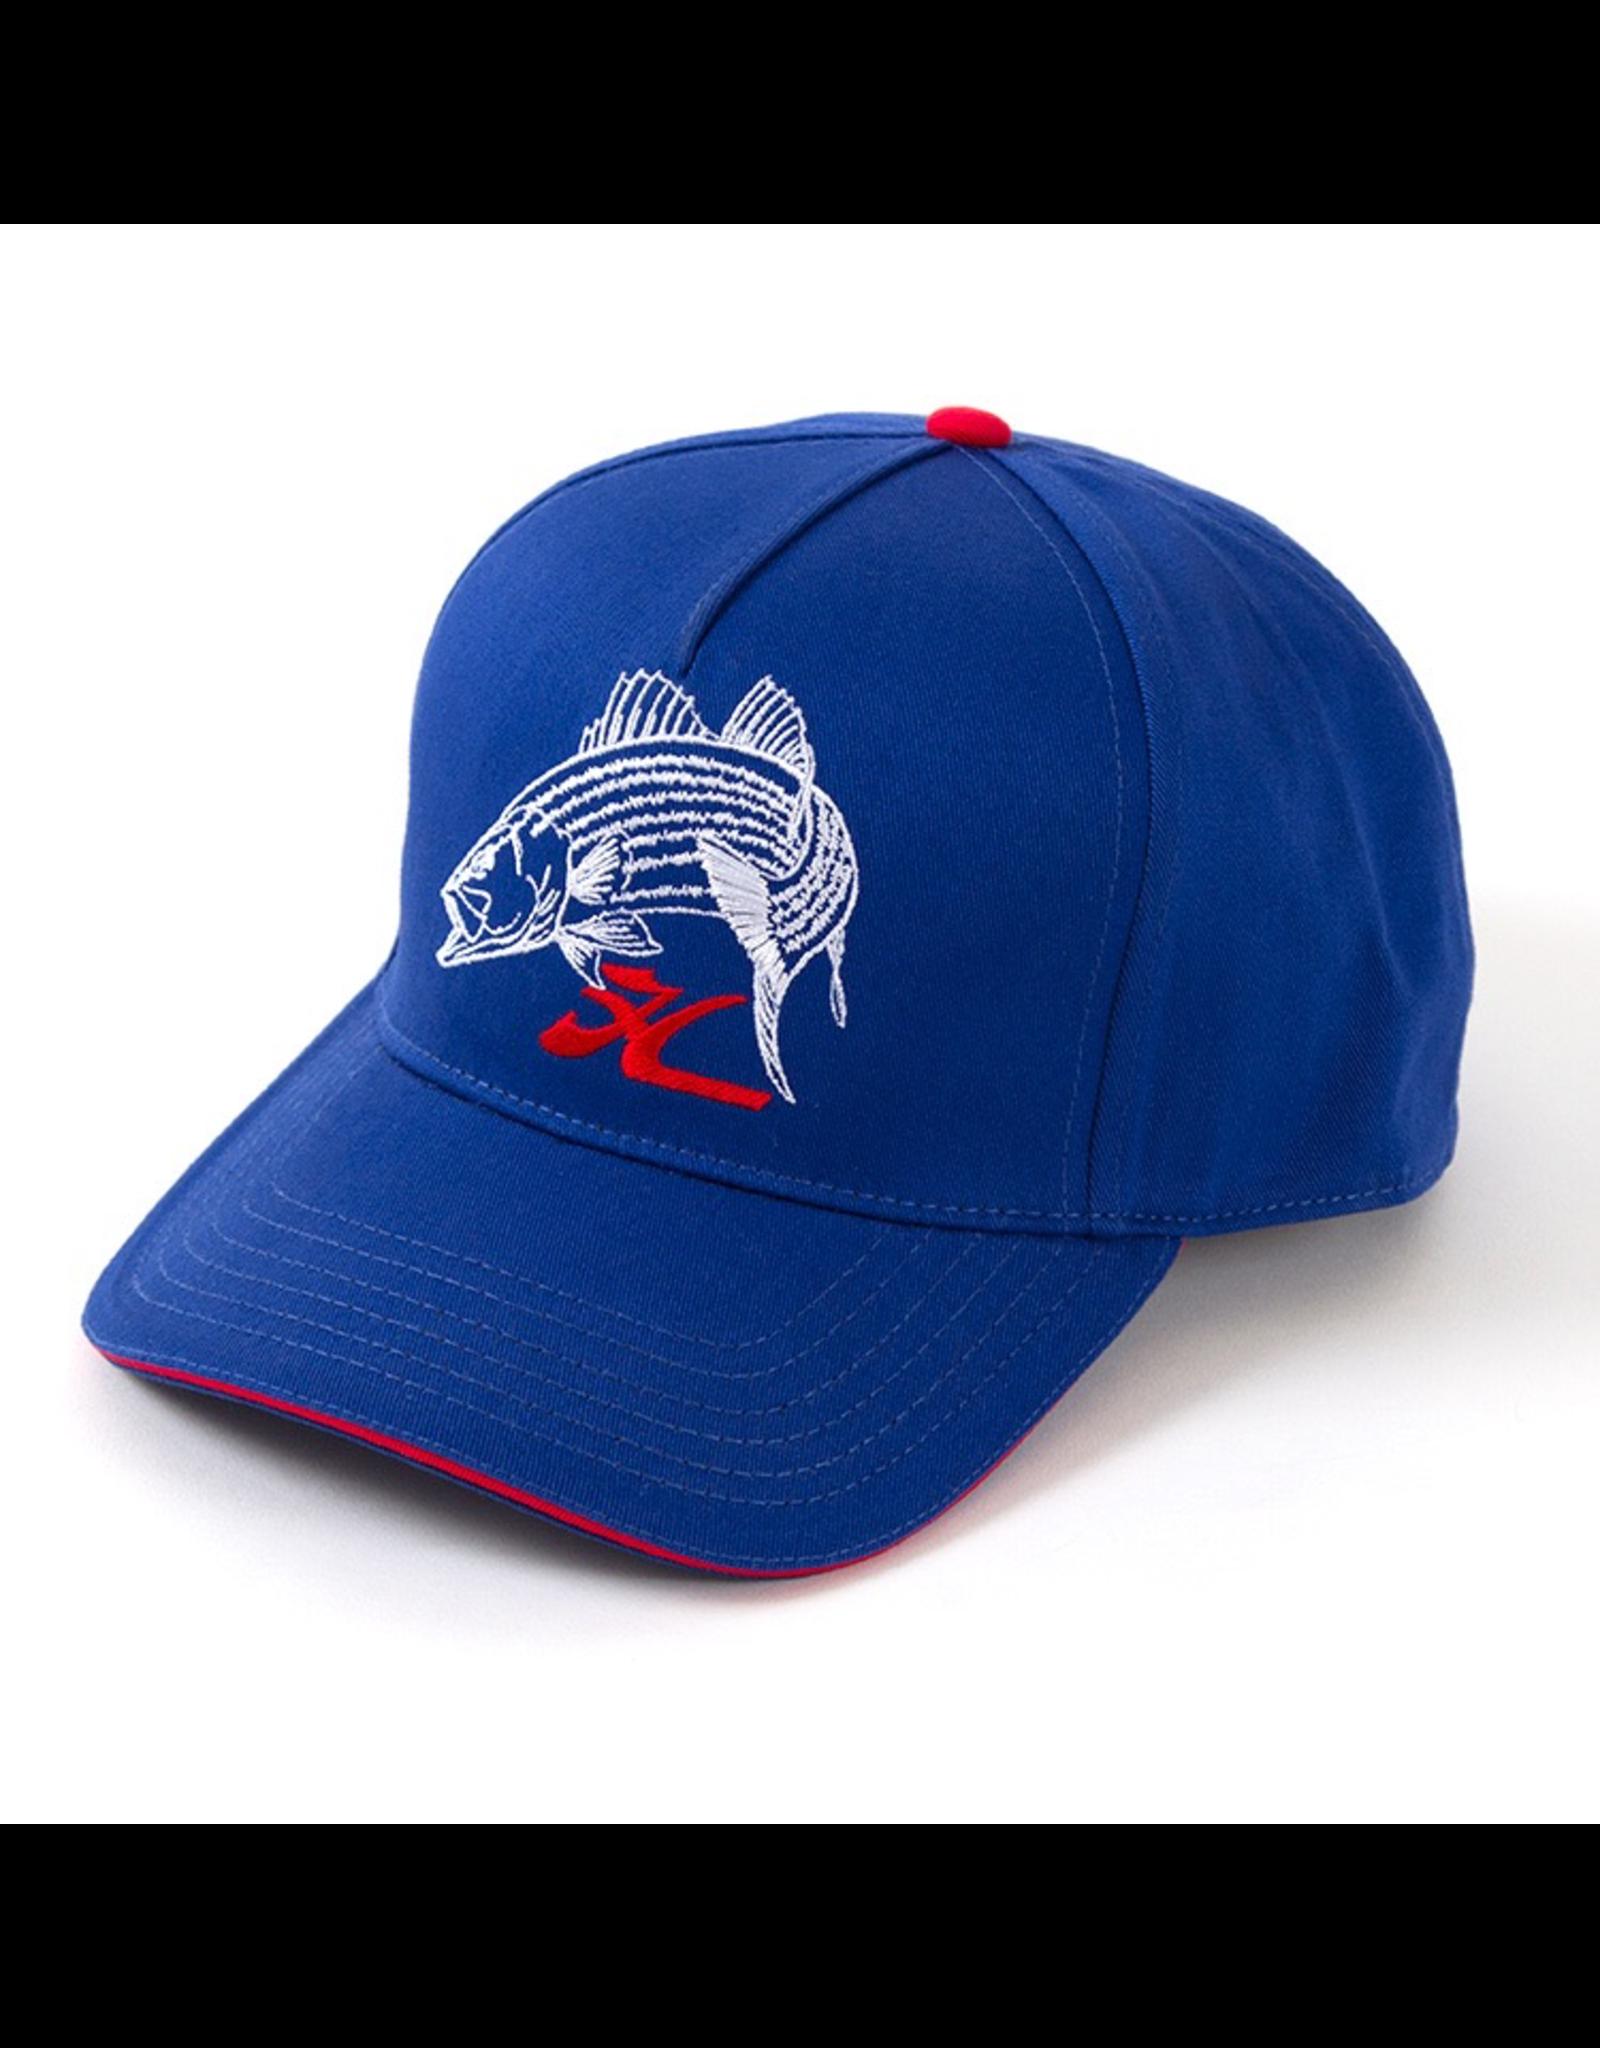 Hobie Hobie Hat, Blue, Striper